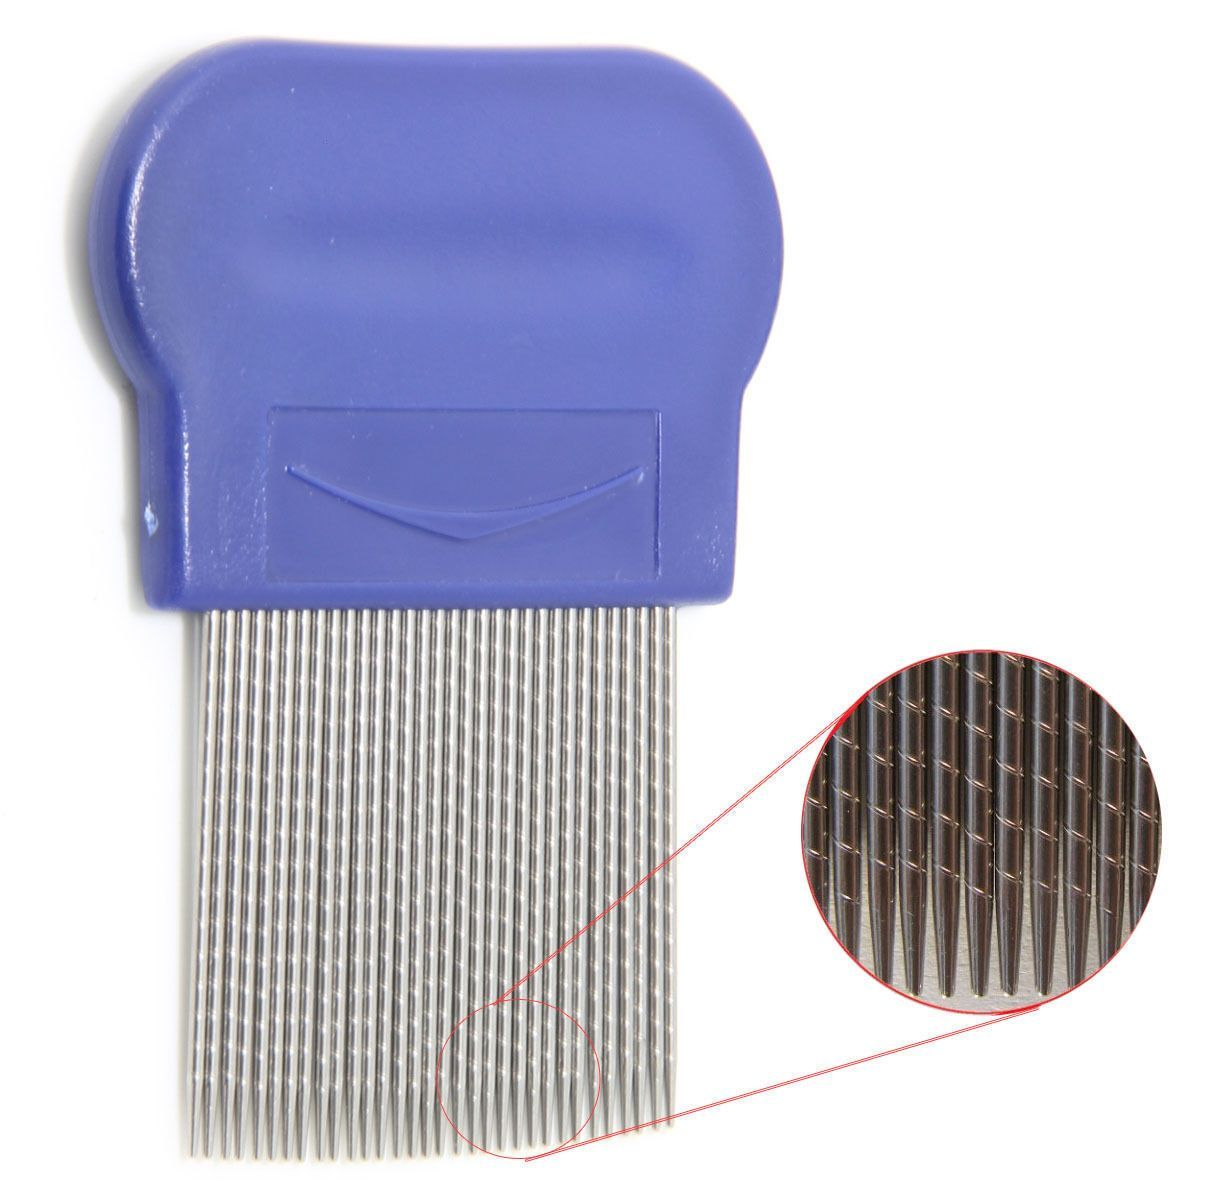 Best Hair Lice Nit Free Pets Flea Eggs Dust Remover